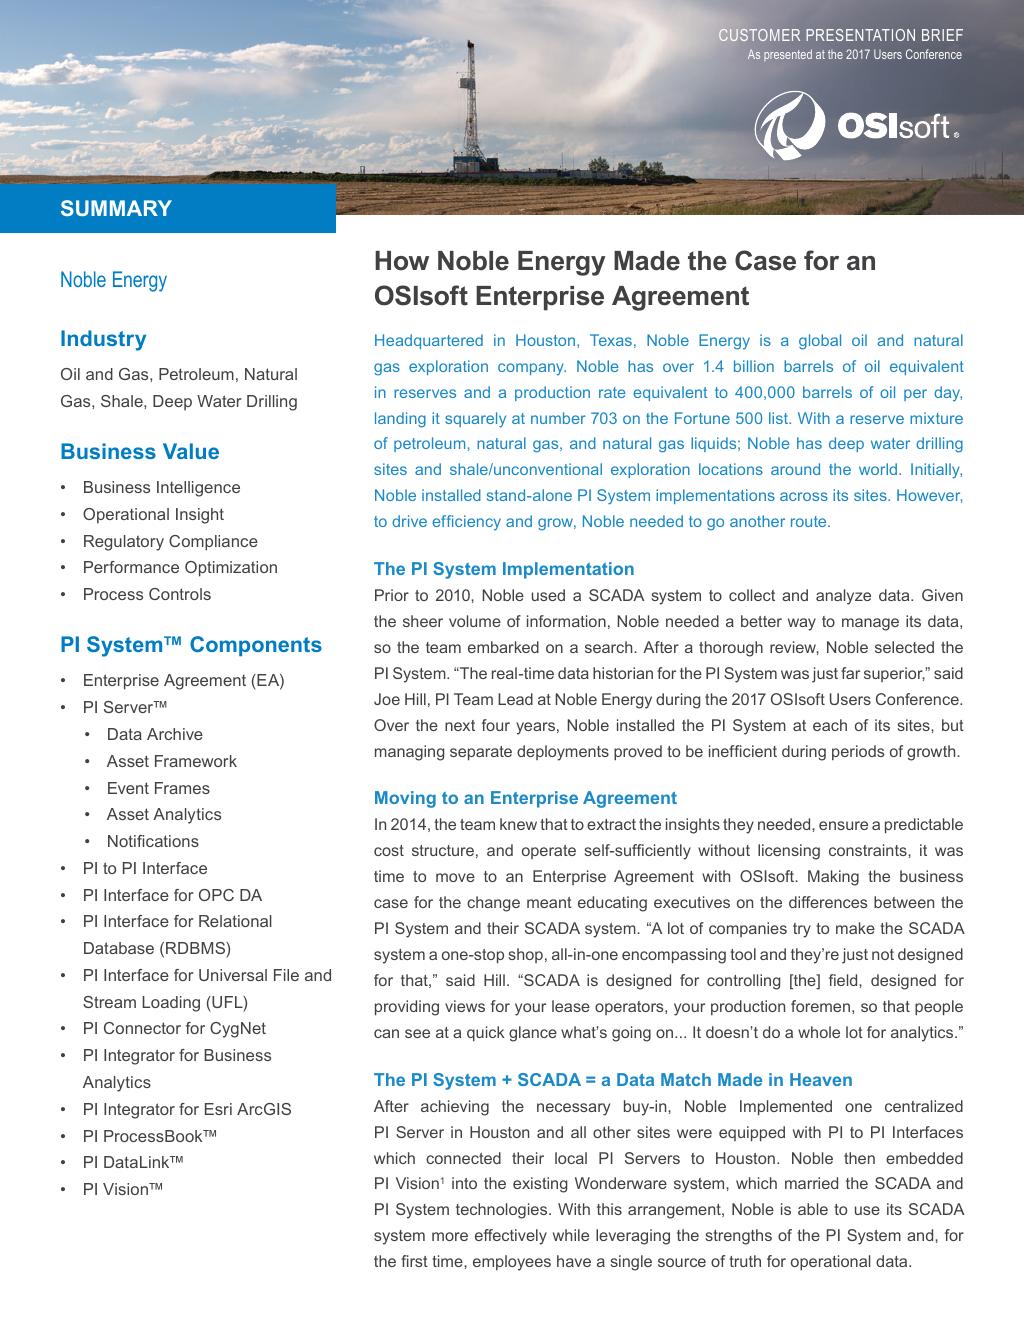 Noble Energy Makes the Case for an OSIsoft Enterprise Agreement